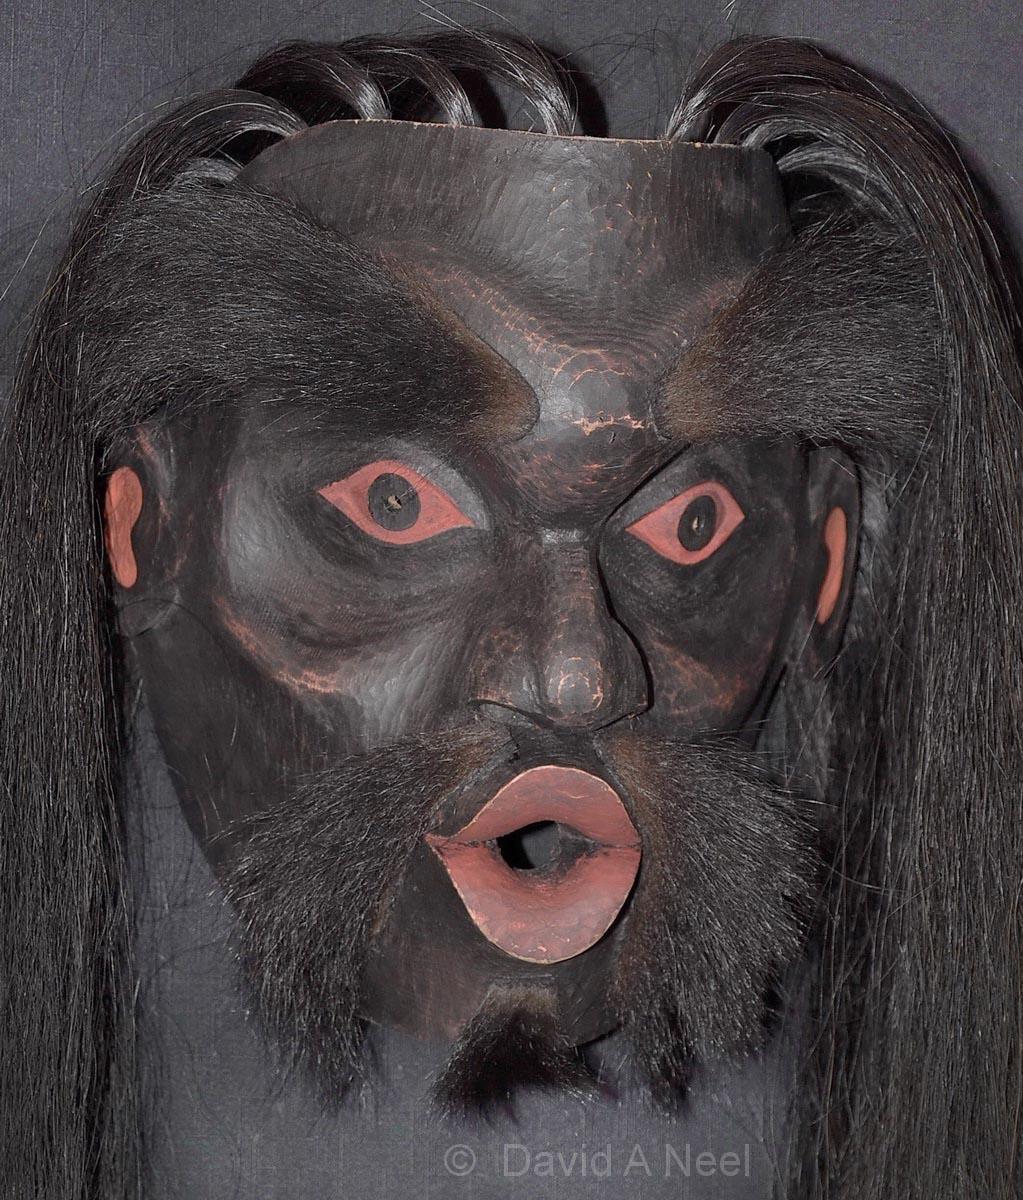 Dzukowa / Wild Woman of the Woods Mask